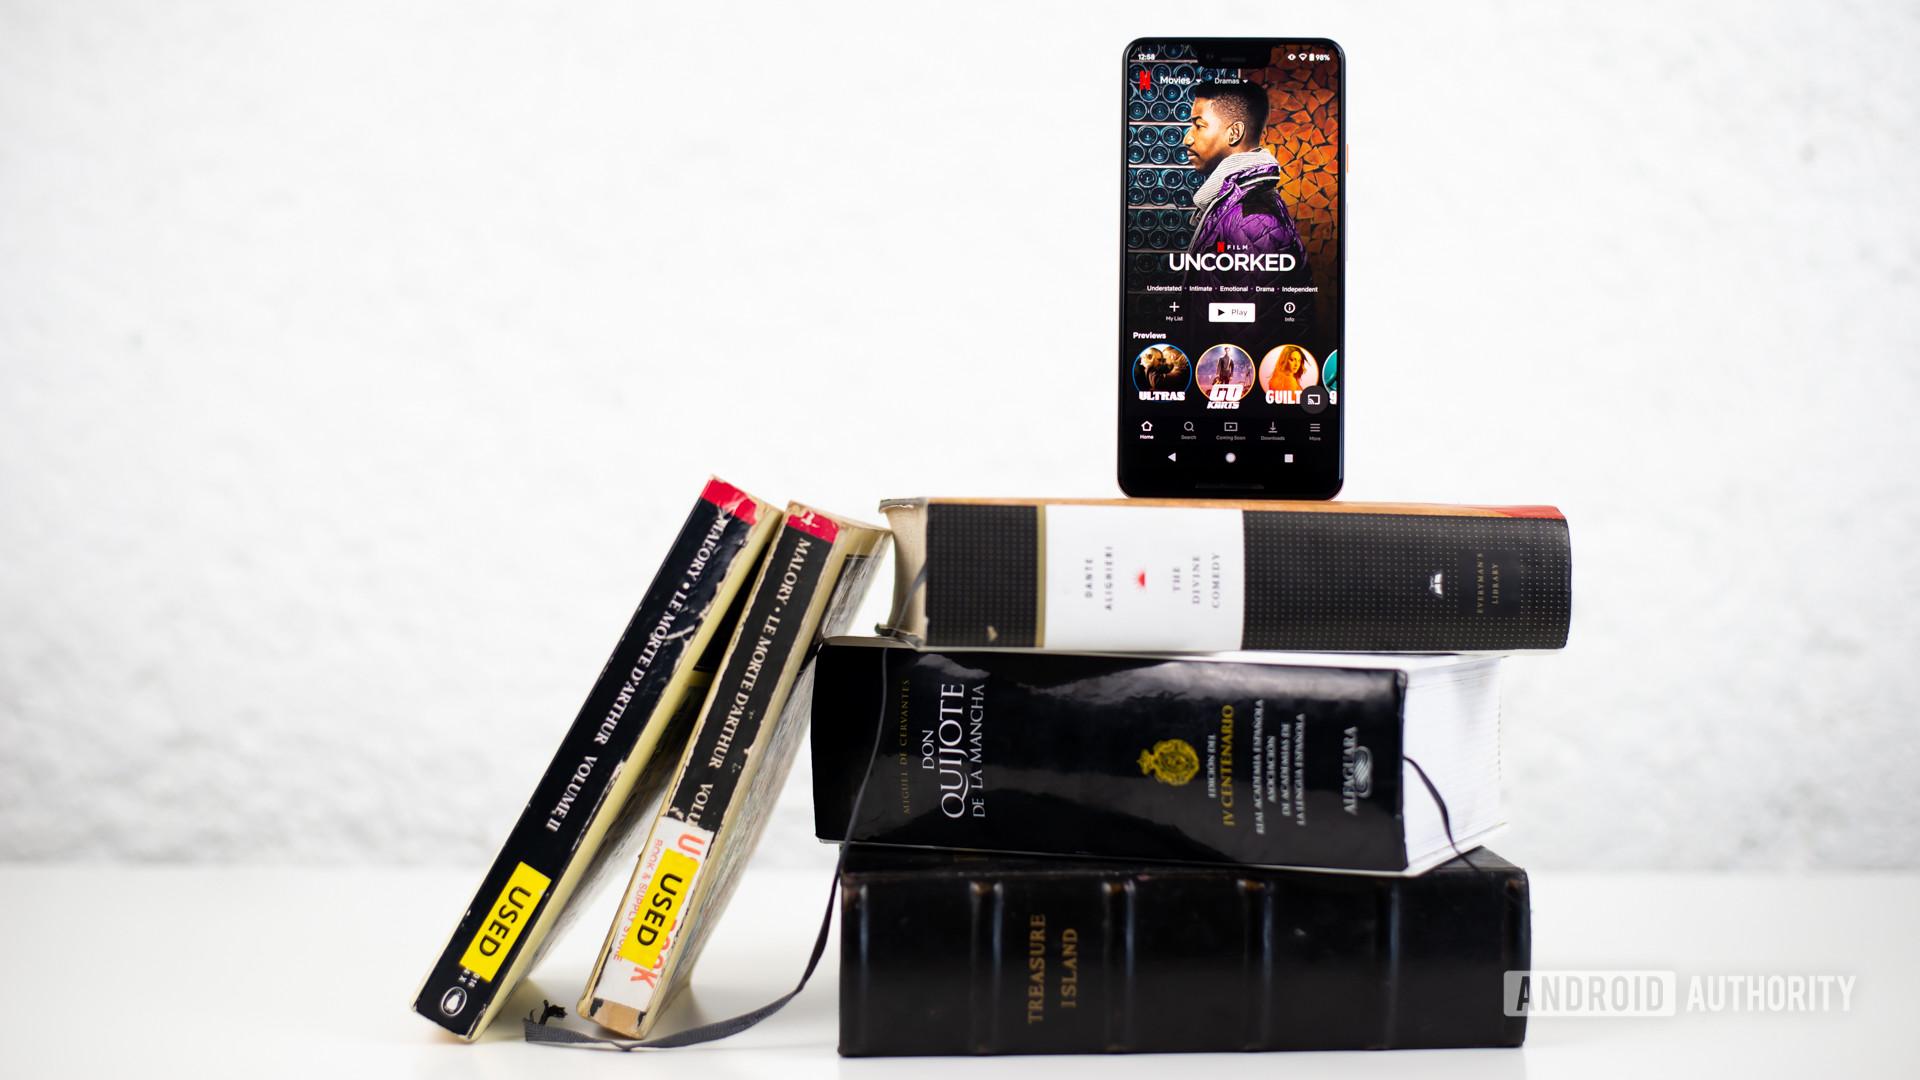 Netflix dramas on smartphone stock photo 3